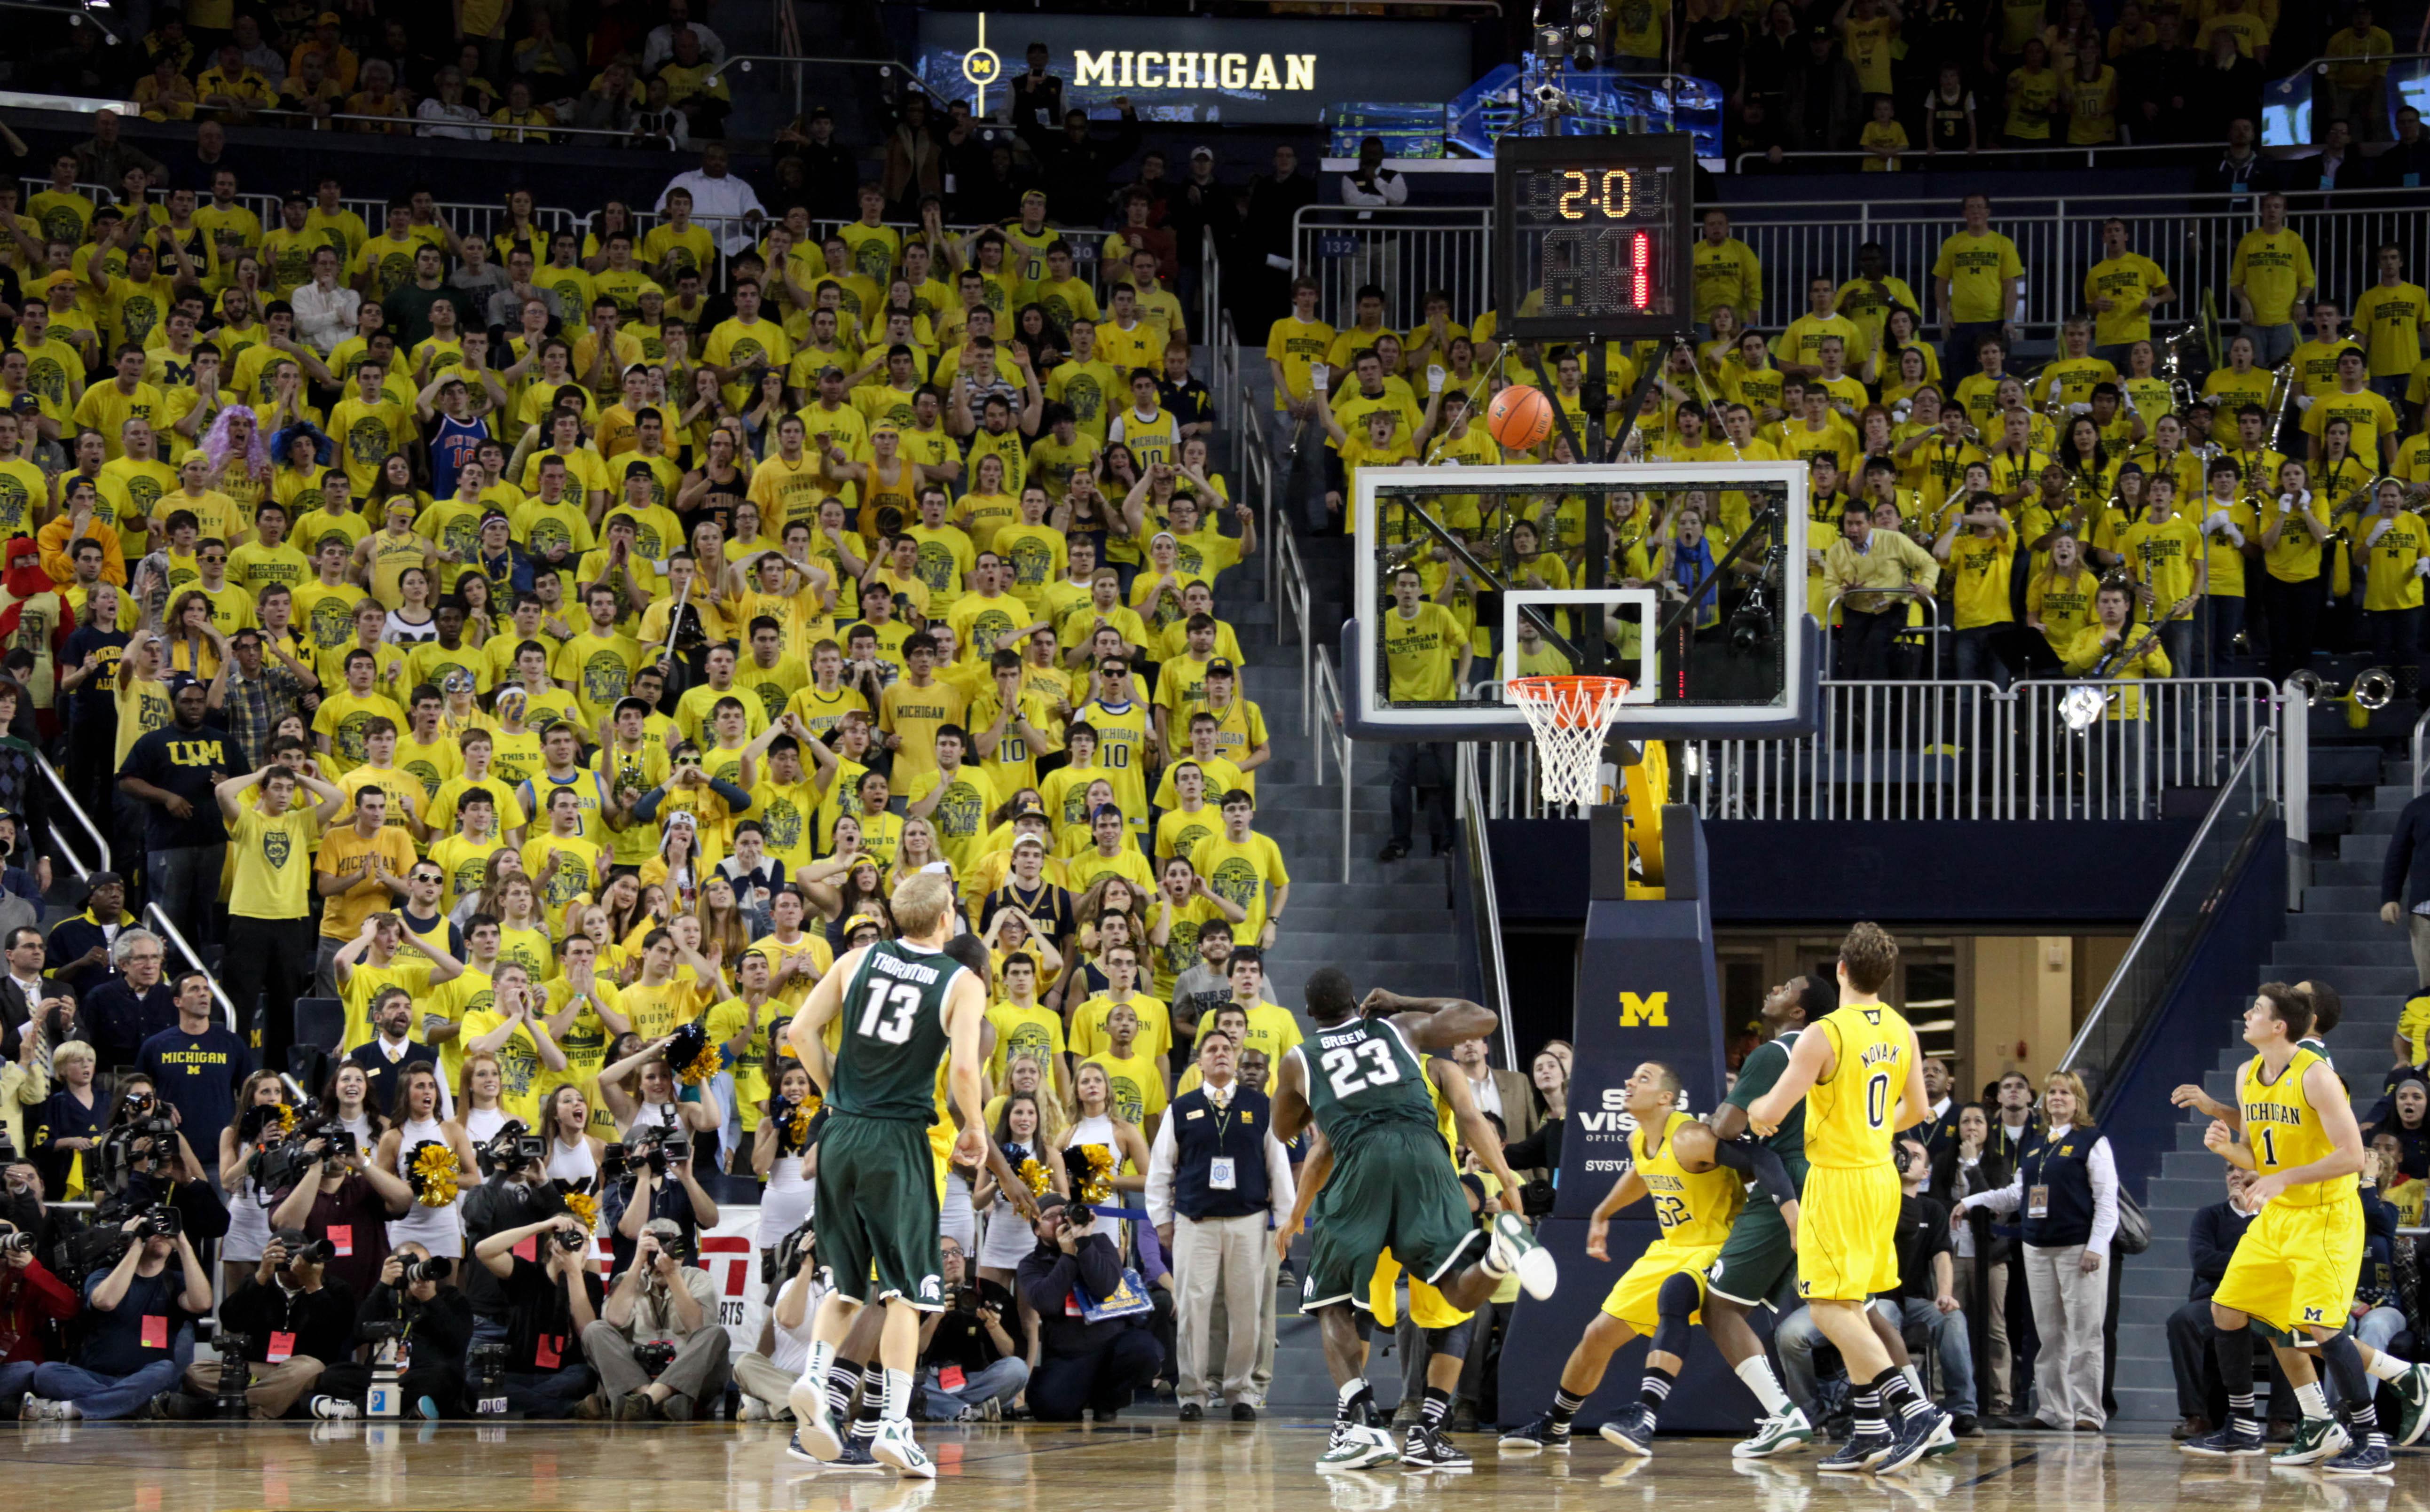 Michigan State at Michigan 29